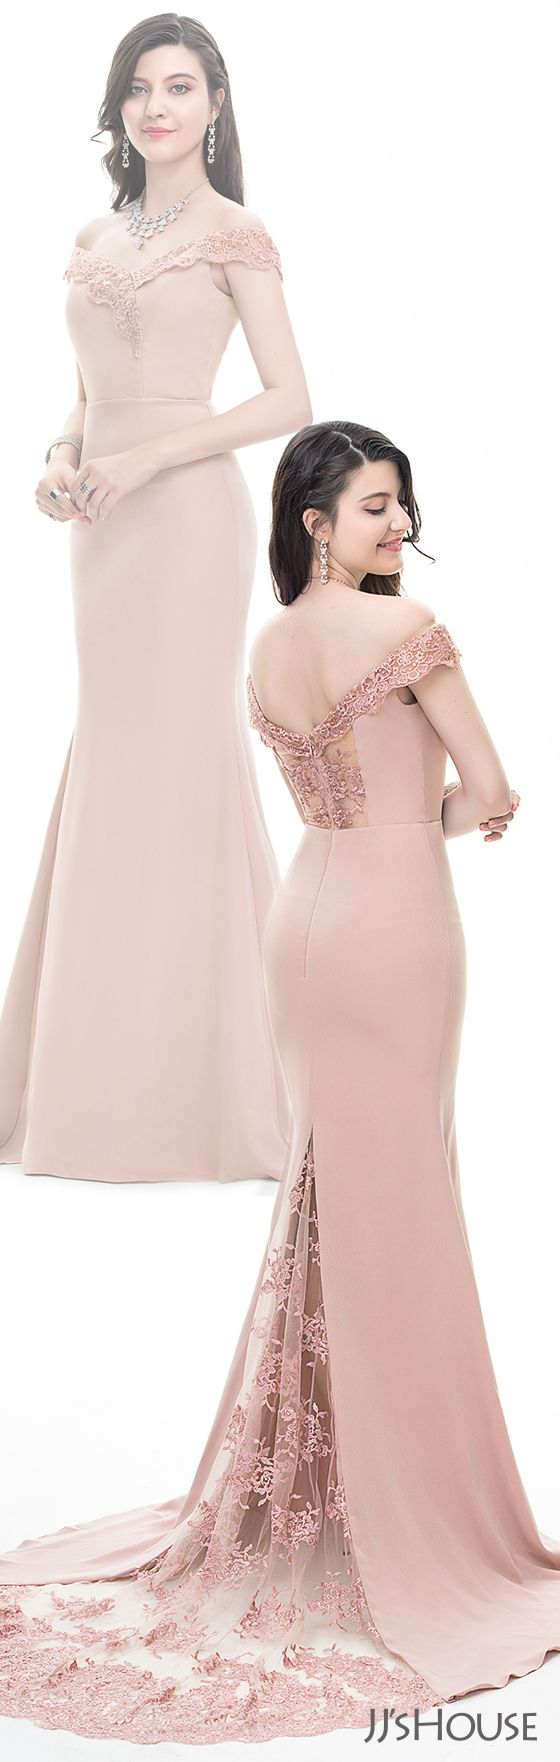 JJsHouse #Prom   clothes   Pinterest   Vestiditos, Vestidos de ...